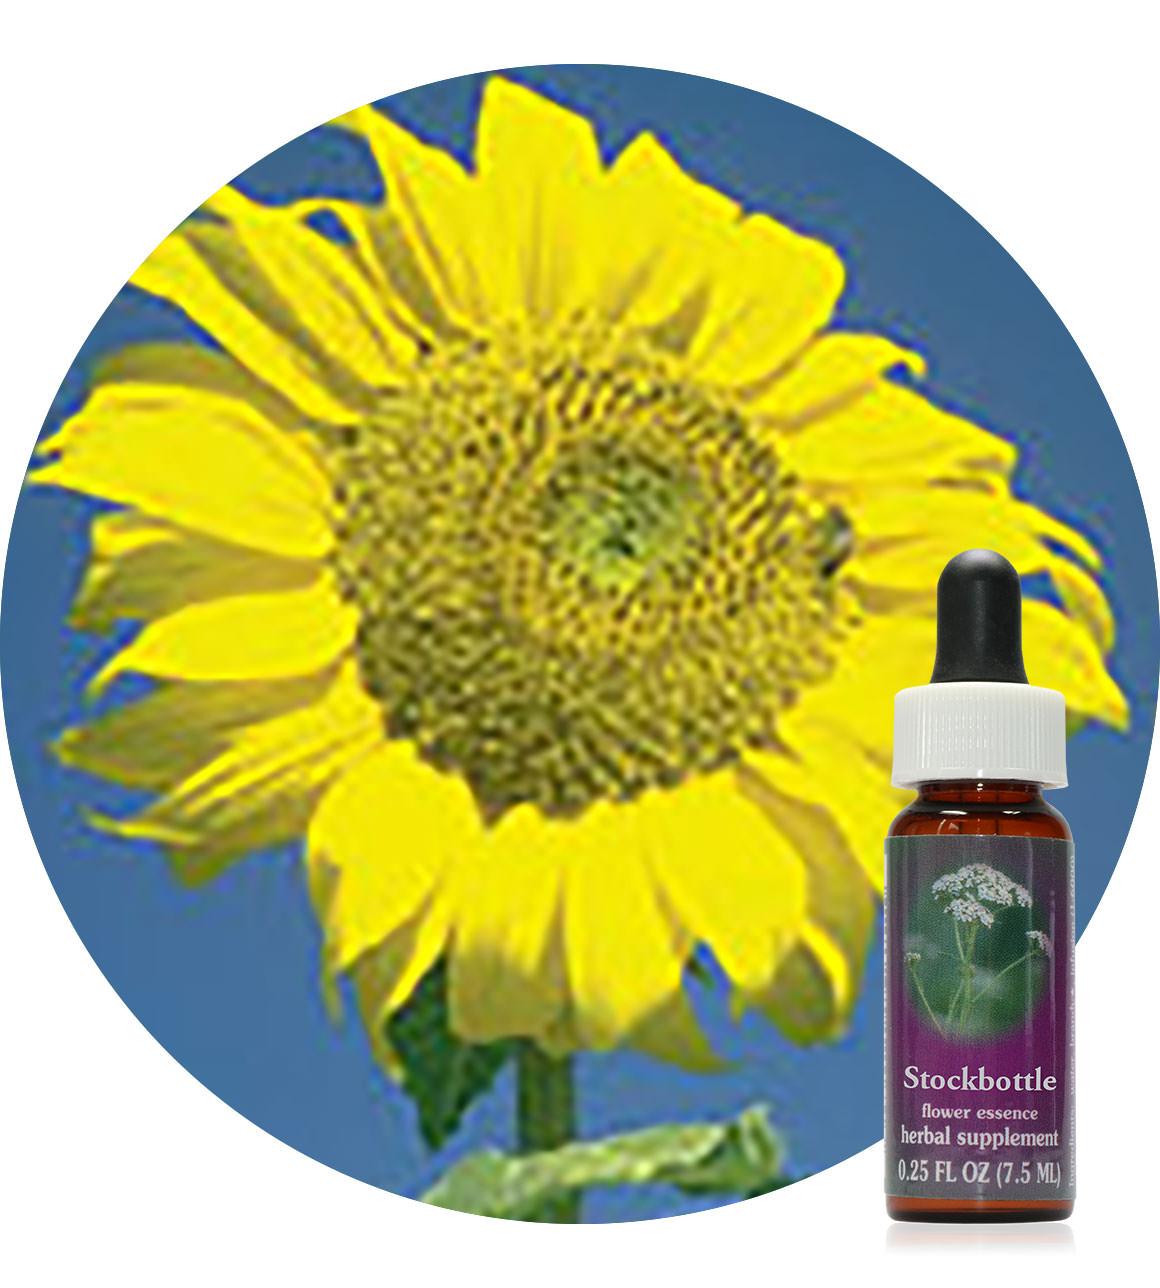 092. Sunflower